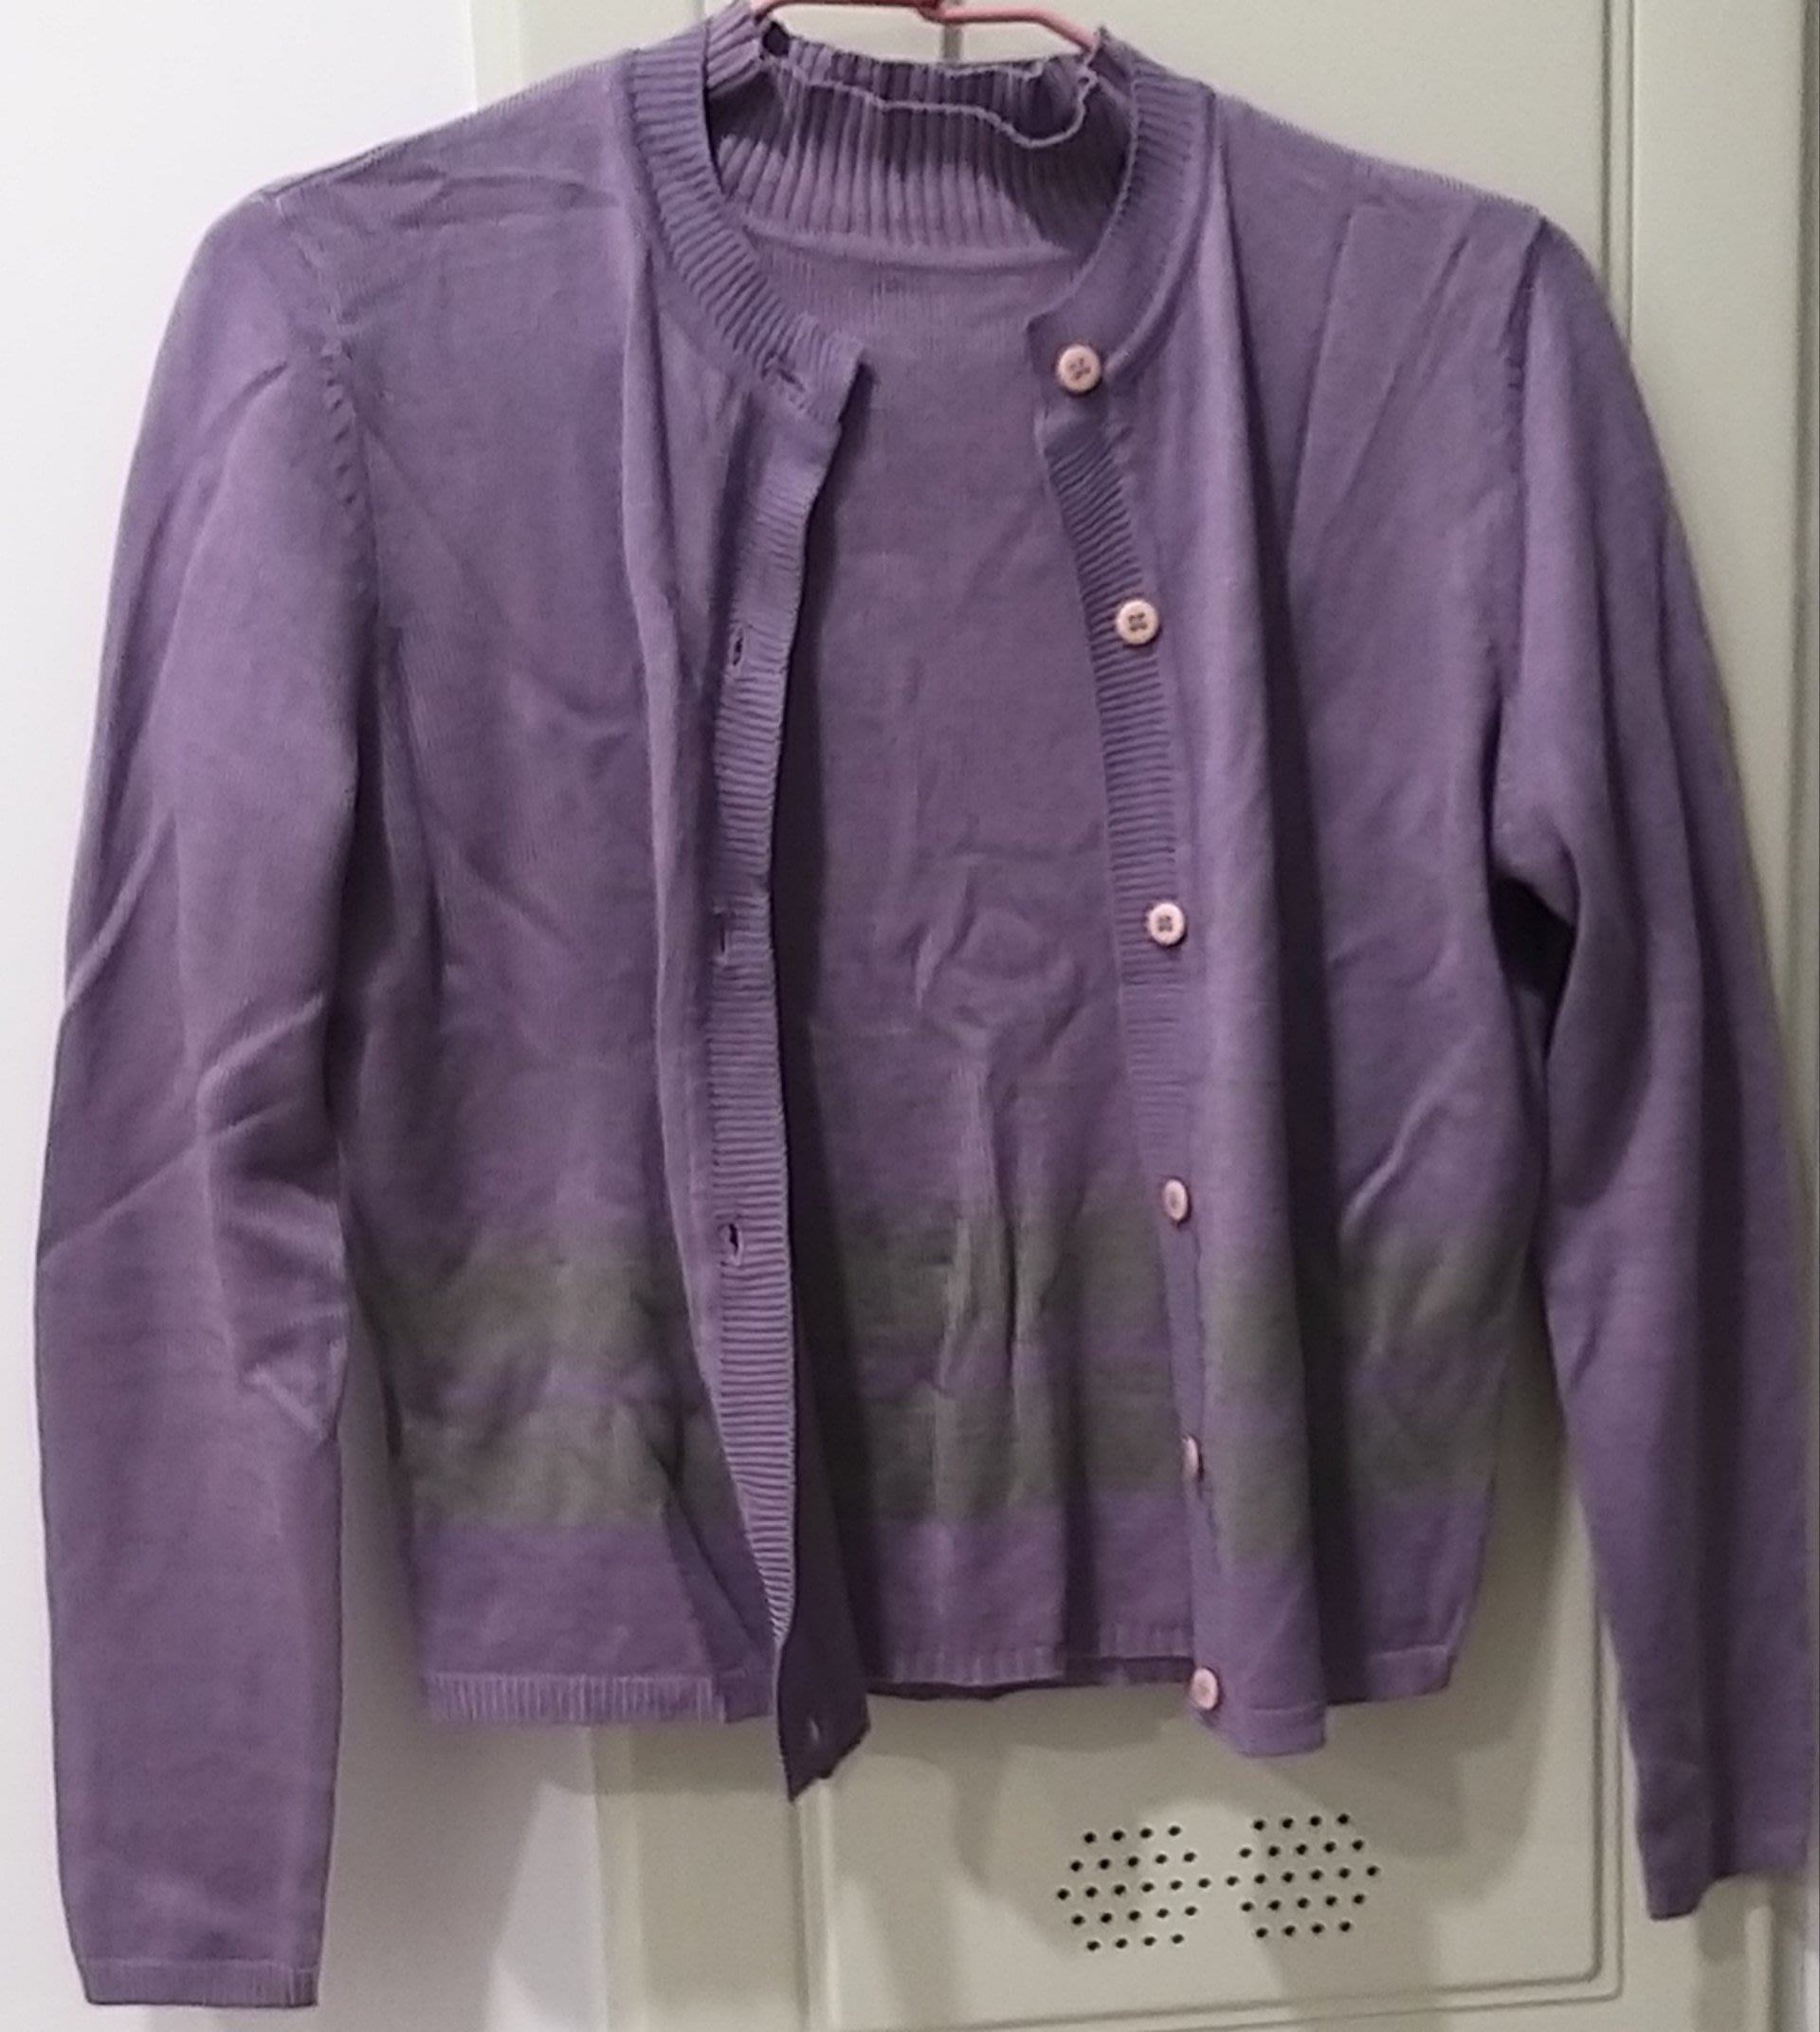 RESERVED 紫色 二件式針織 外套 + 立領短袖上衣 歐碼 38號/M號 181元起標